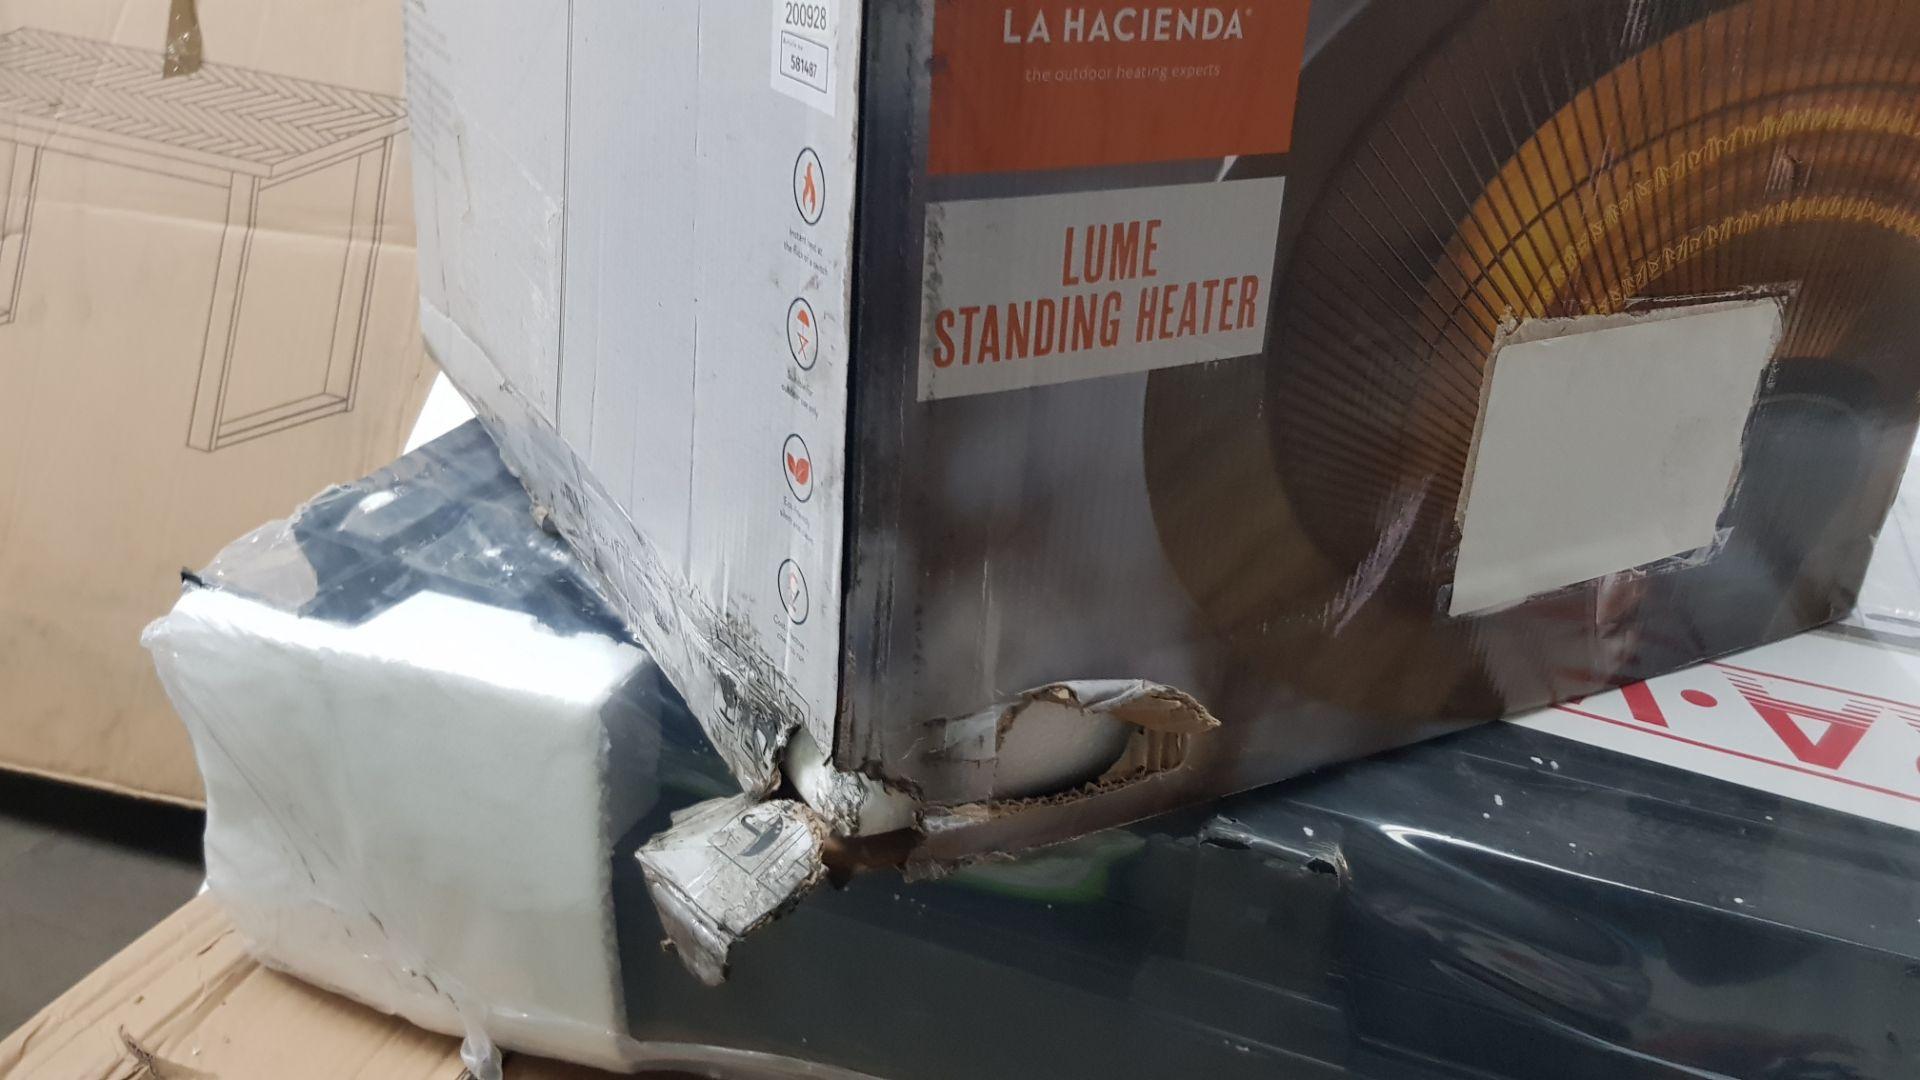 (P6) 1x La Hacienda Lume Standing Heater RRP £99.99 3 Heater Settings: 900W, 1200W & 2100W (H205x - Image 4 of 4